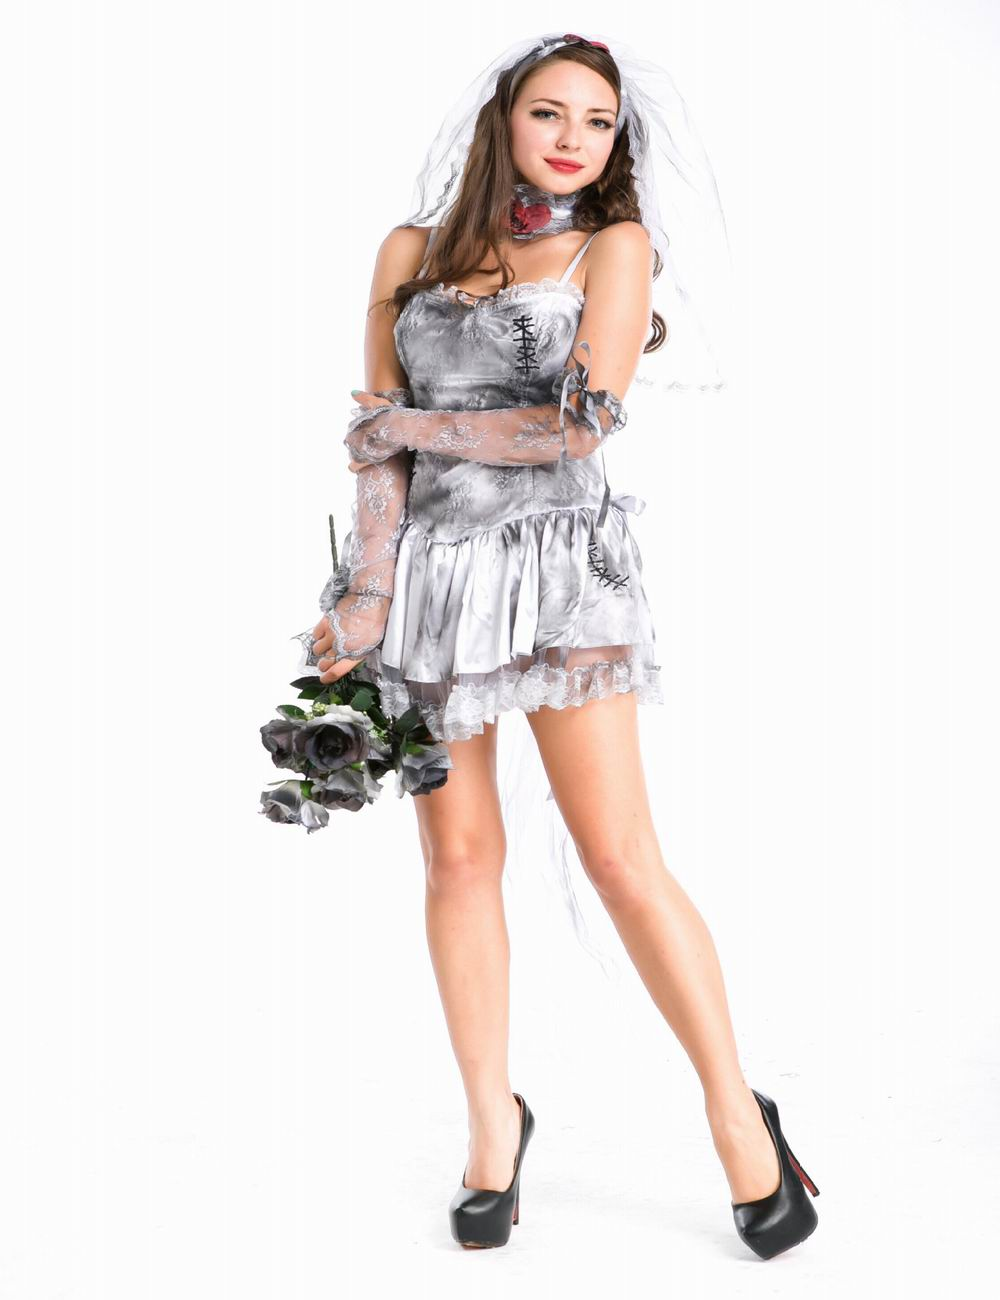 Ensen Succuba Ghost bride Vampire dress Scarey font b cosplay b font costume zombie Chucky fantasias